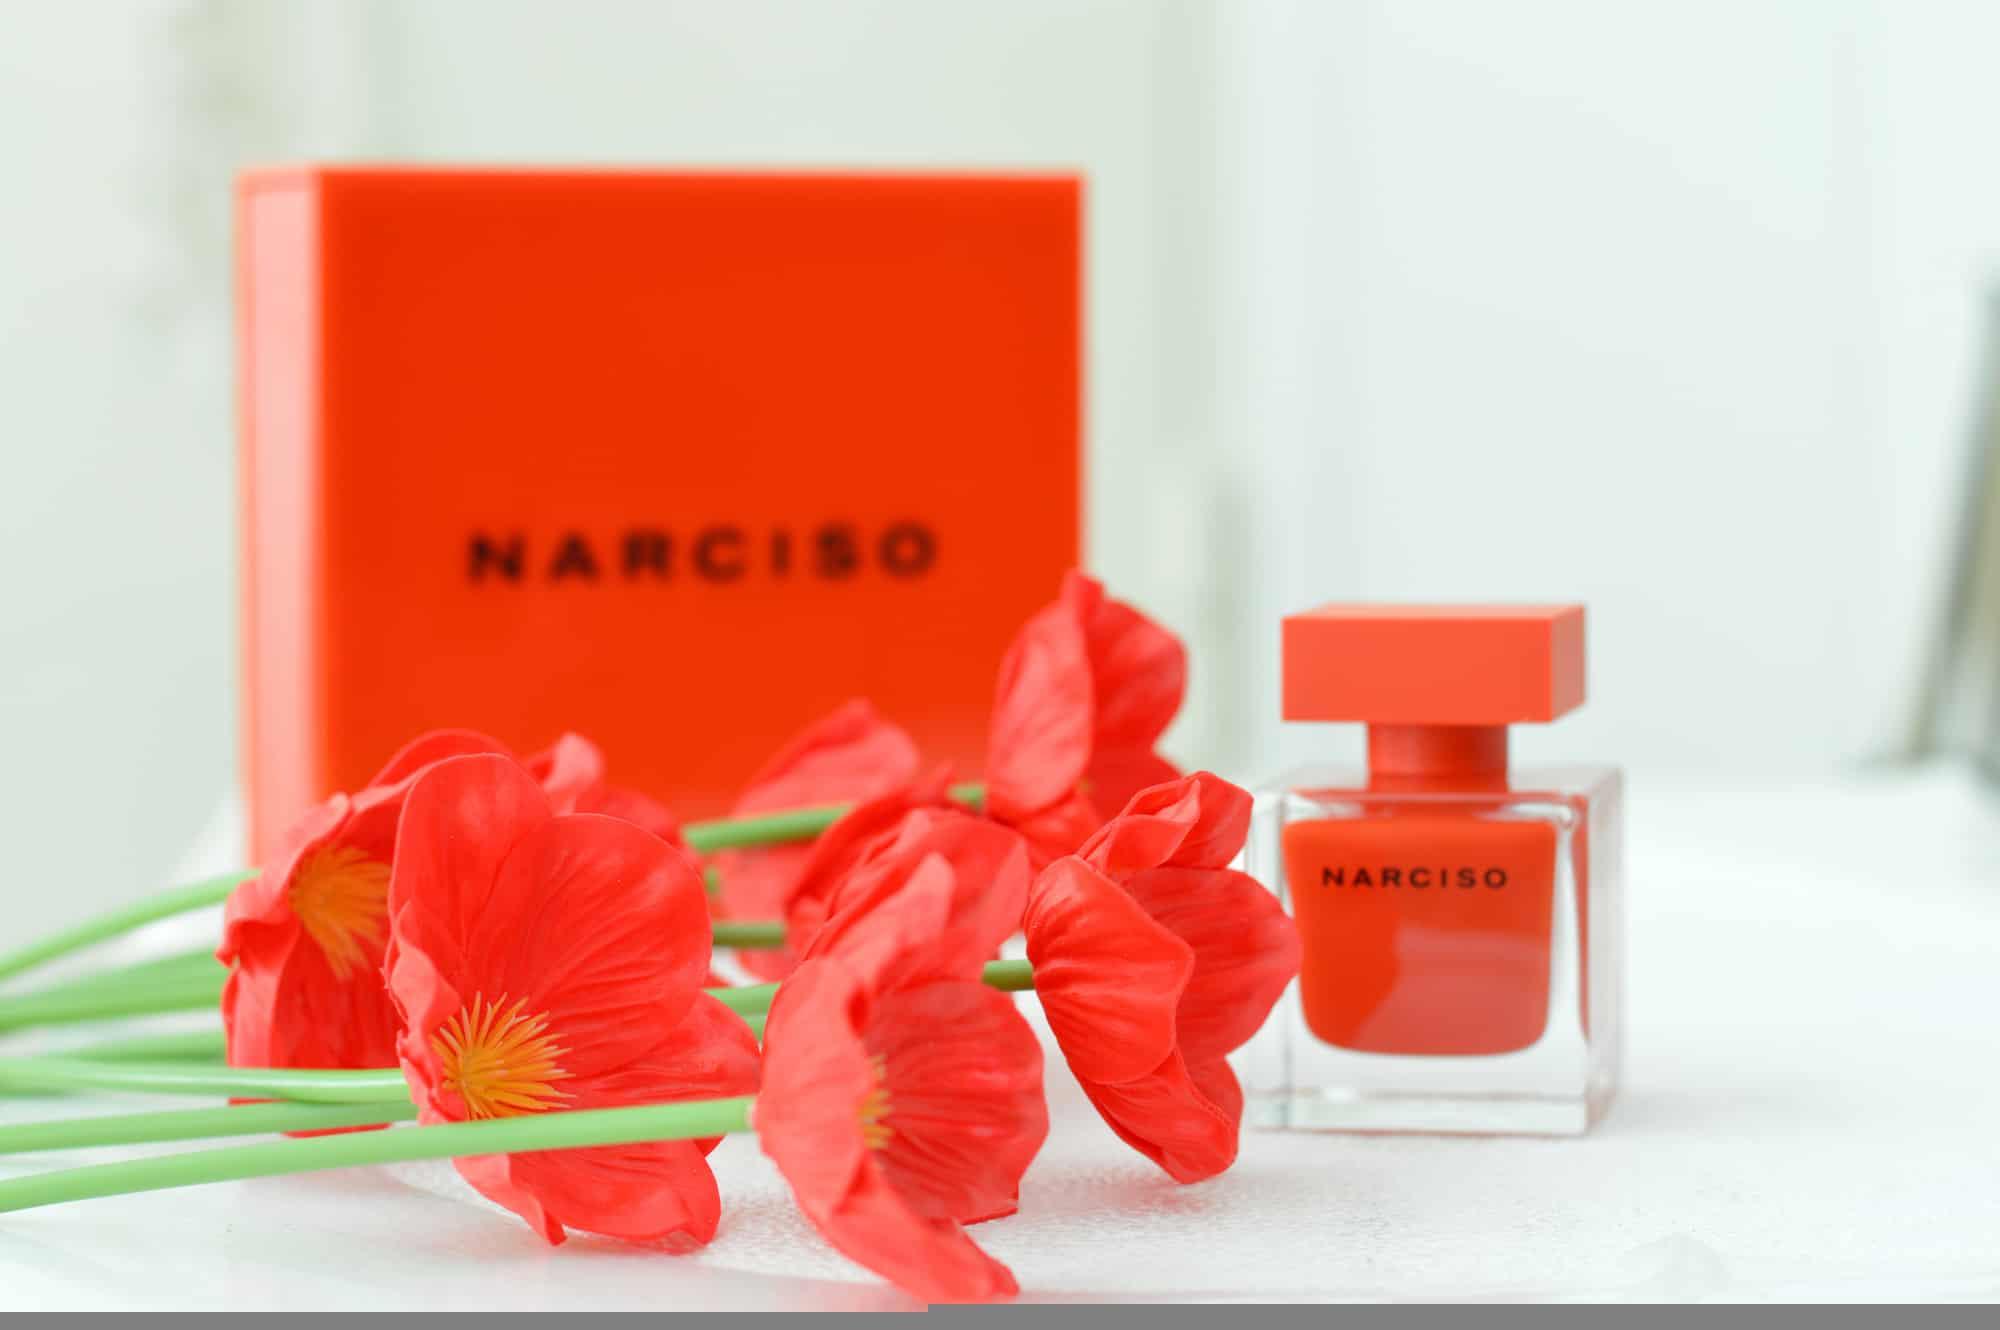 narciso rodriguez rouge 2 - ادو پرفیوم زنانه نارسیسو رودریگز مدل Narciso Rouge حجم 90 میلی لیتر